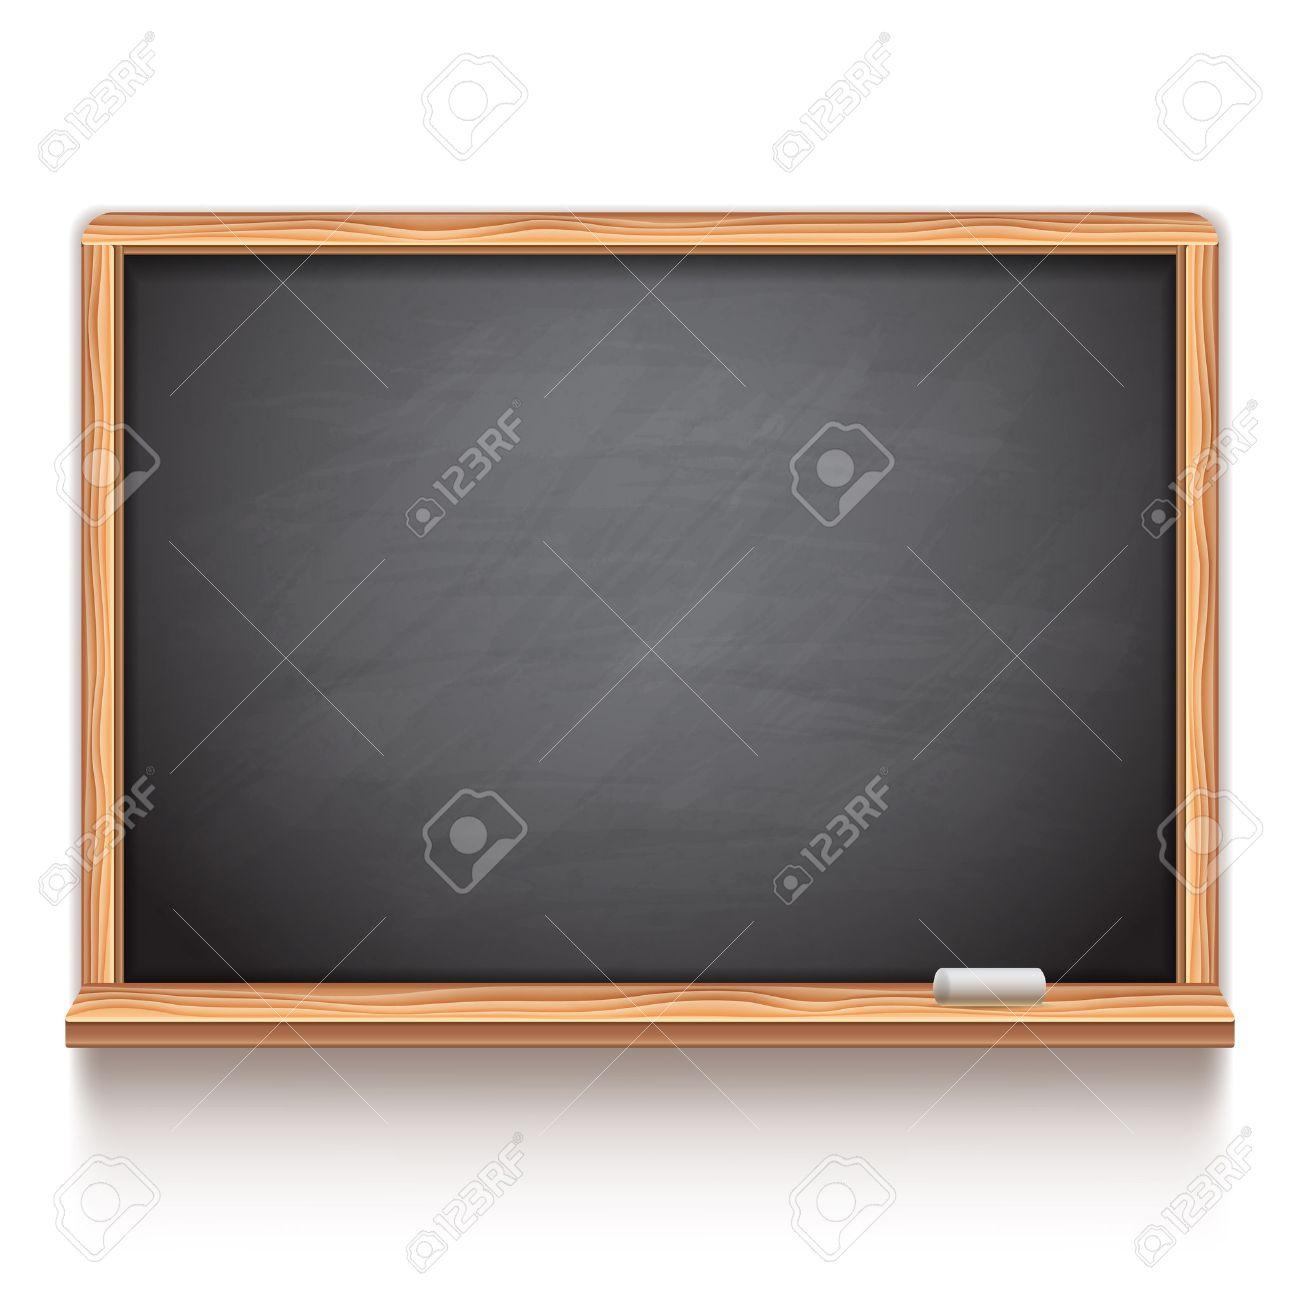 Black school chalk board on white background - 43875393